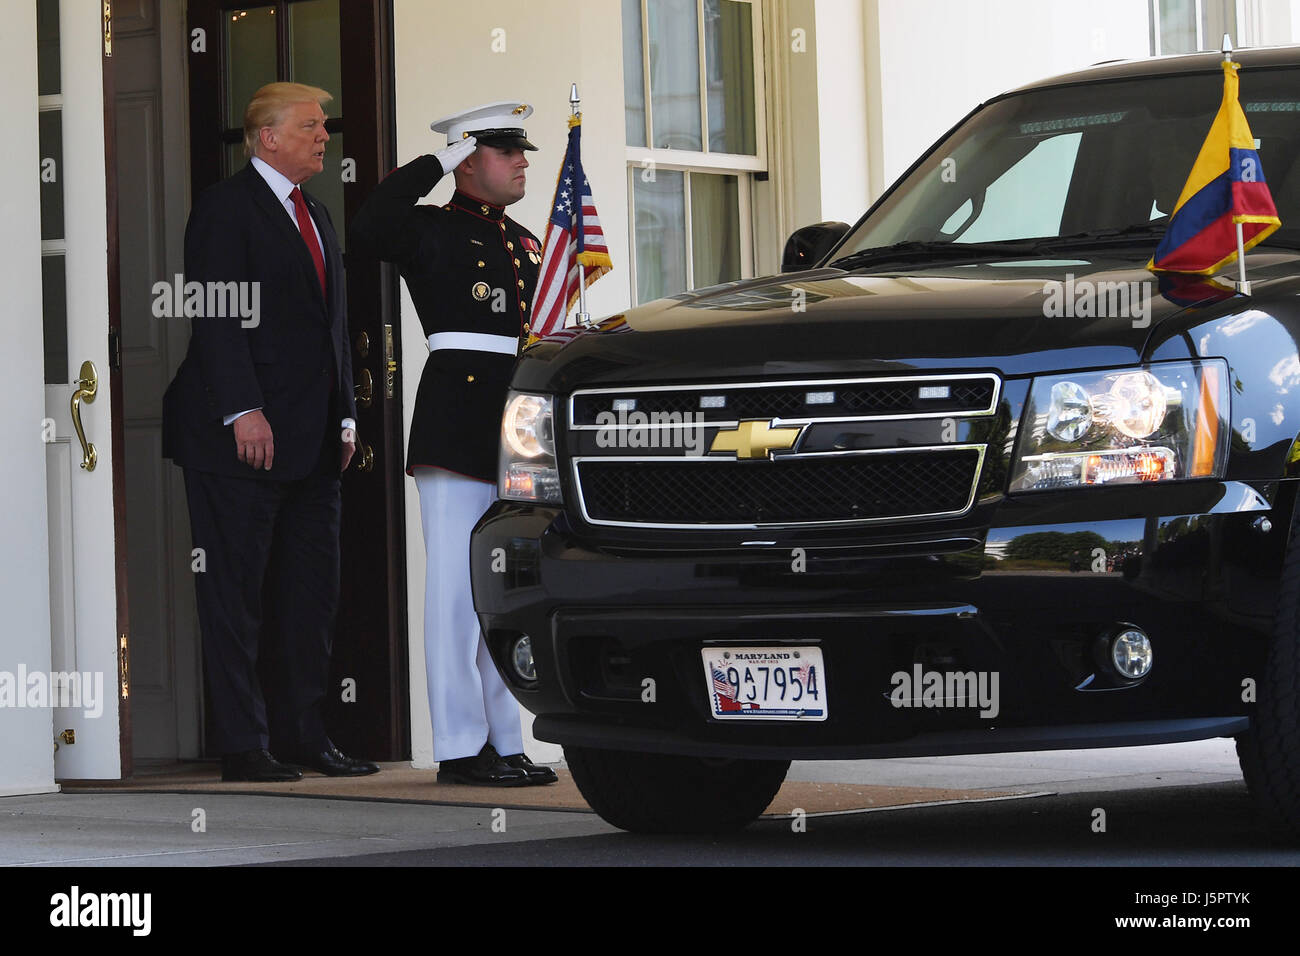 Washington, District of Columbia, USA. 18th May, 2017. May18, 2017-The White House, Washington DC.President Donald - Stock Image